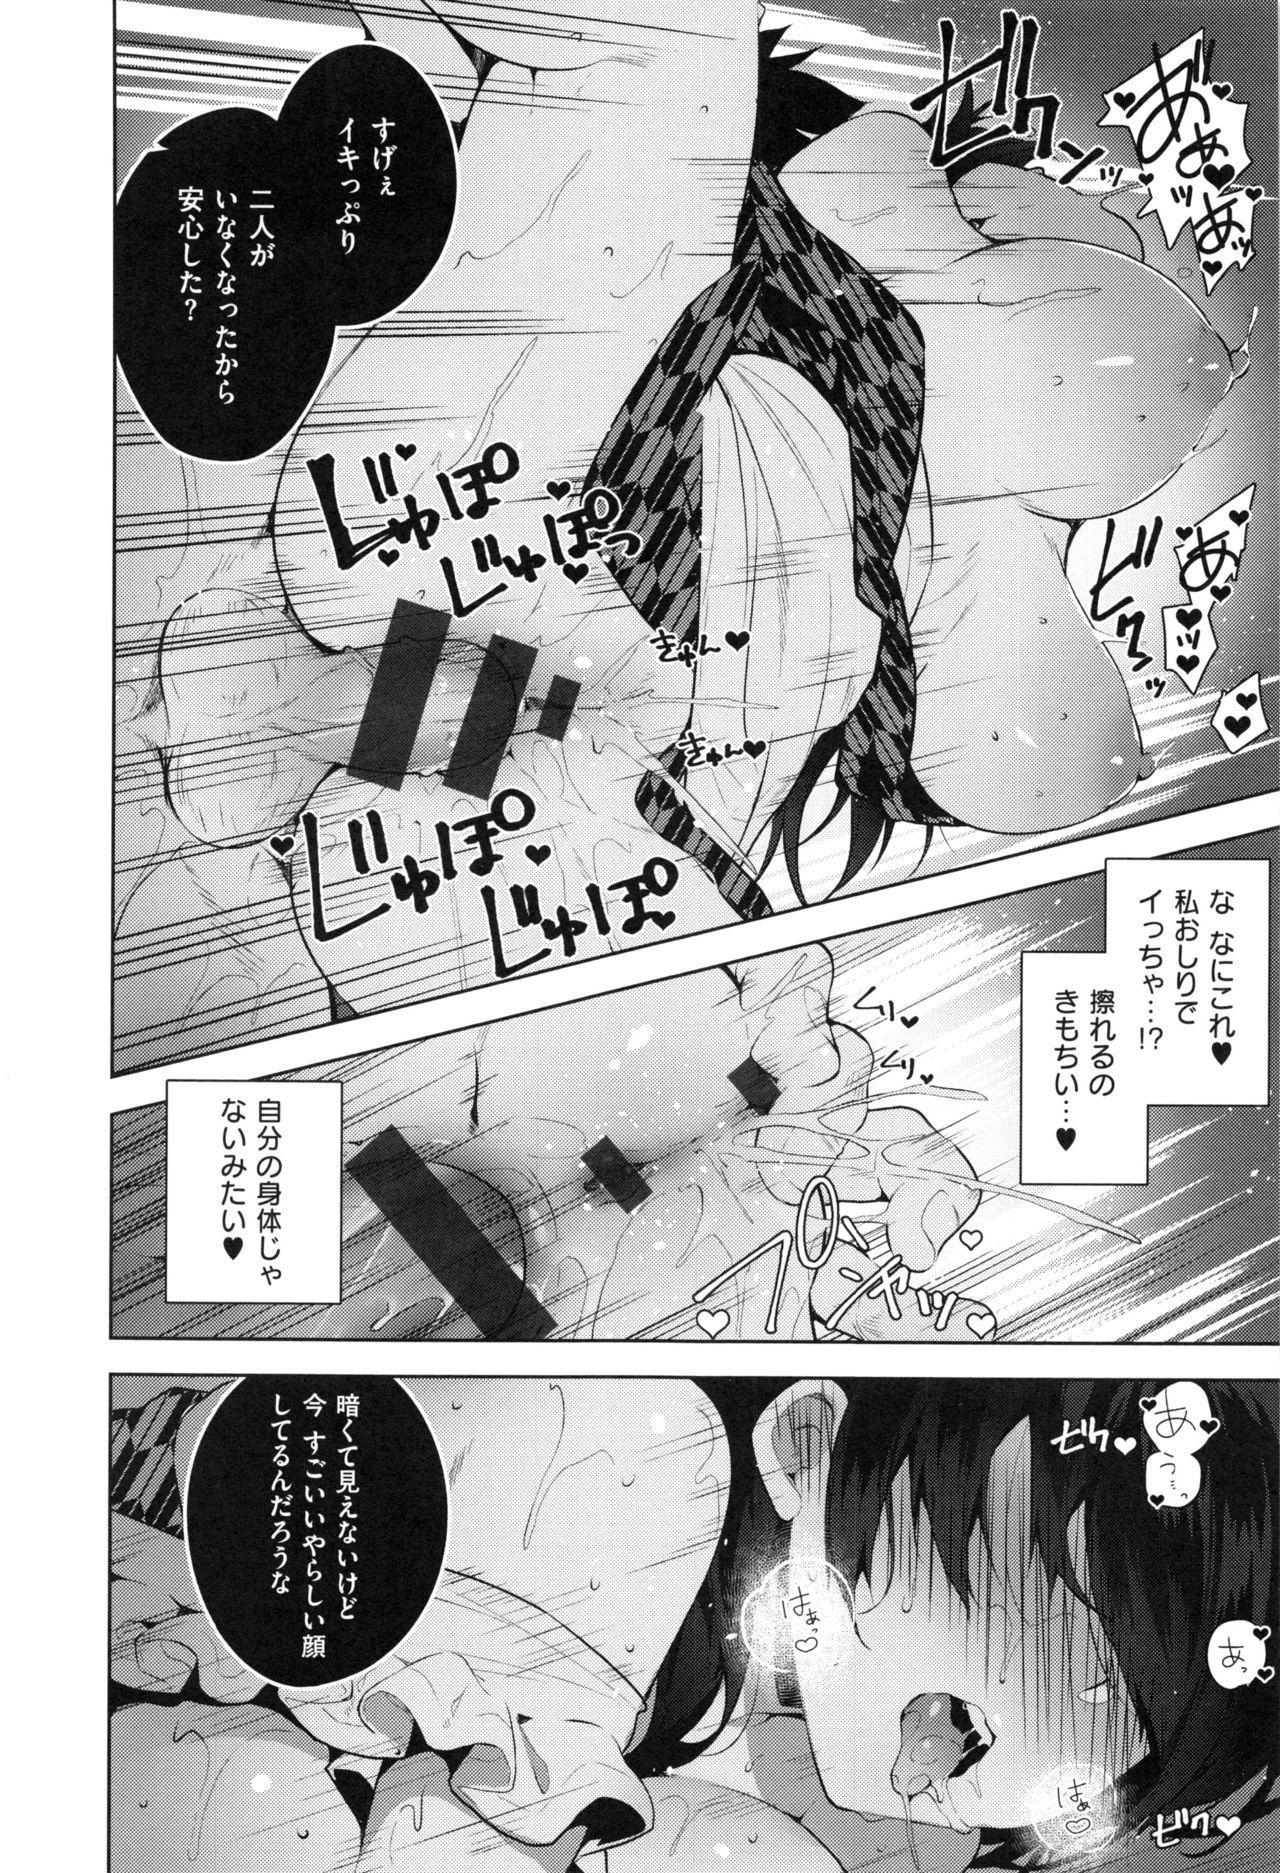 Himitsudere - Secret Love 97